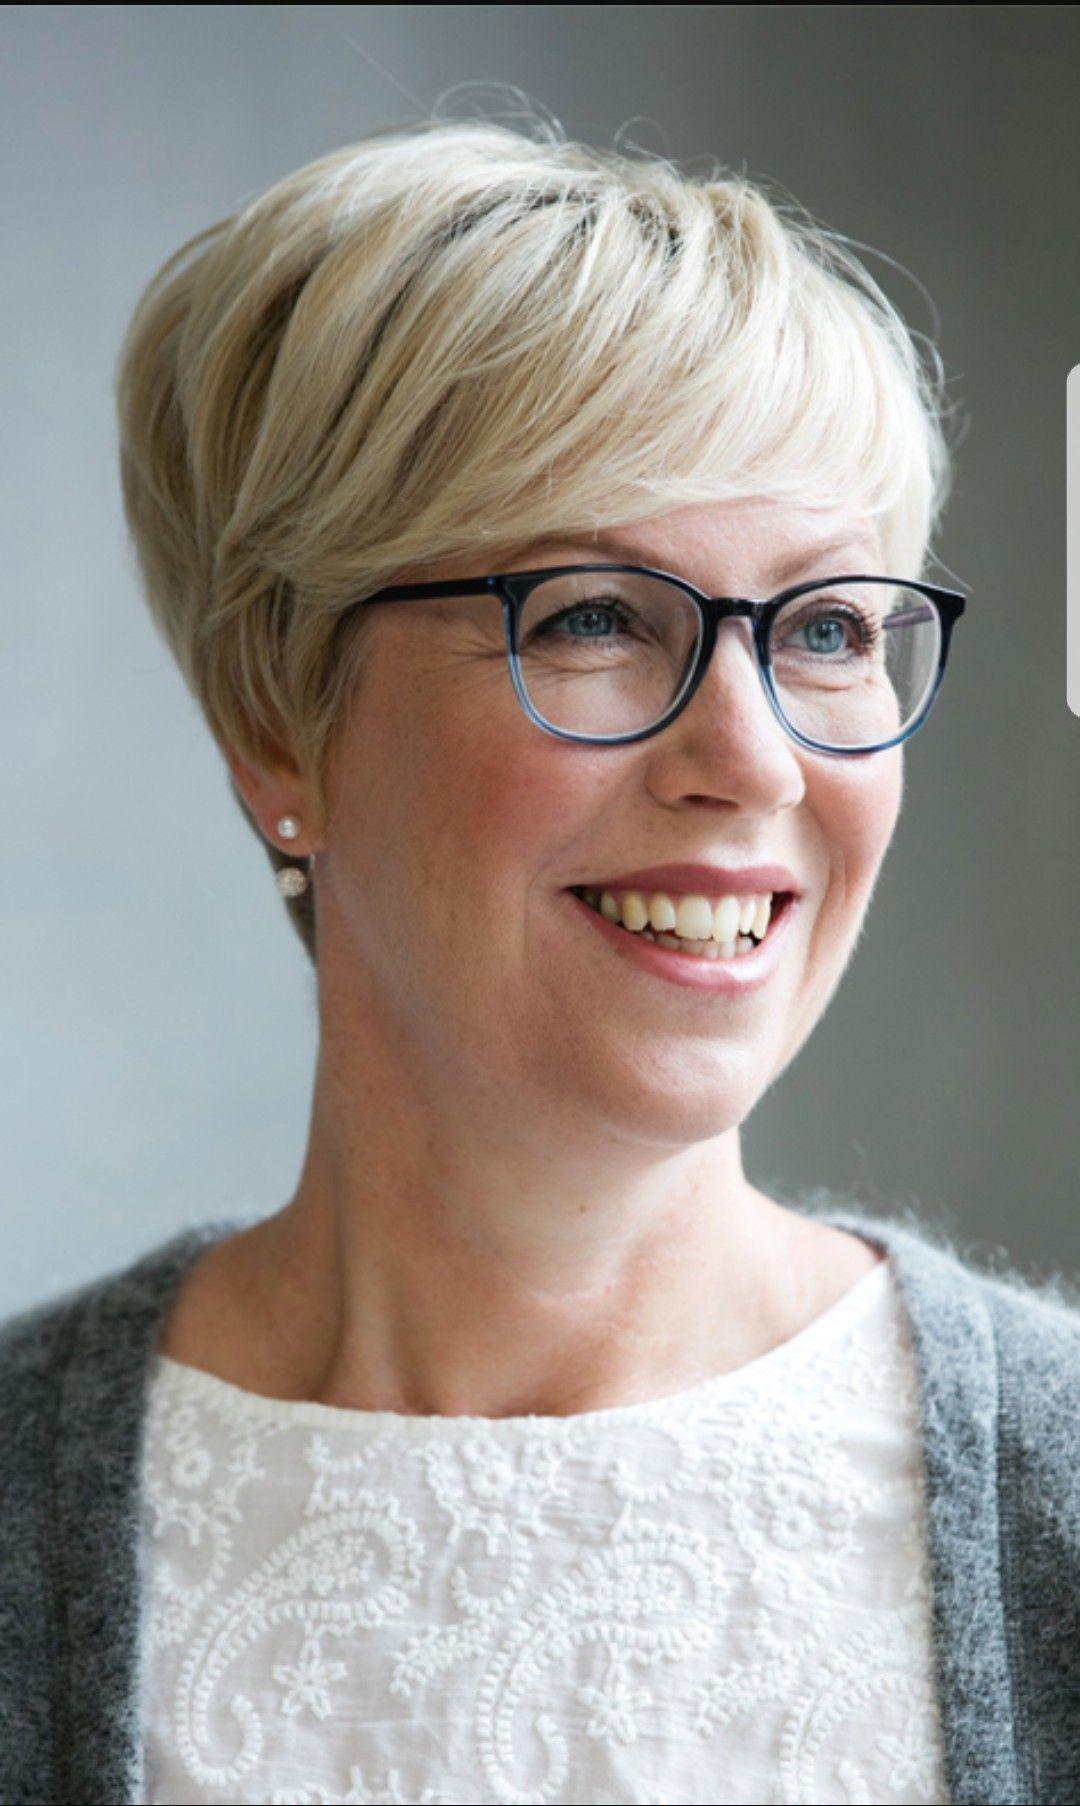 Pin Van Hair Design Fred Van Zijl Op 50 Tinten Grijs Kort Kapsel Dames Met Bril Korte Kapsels Dames Kapsels